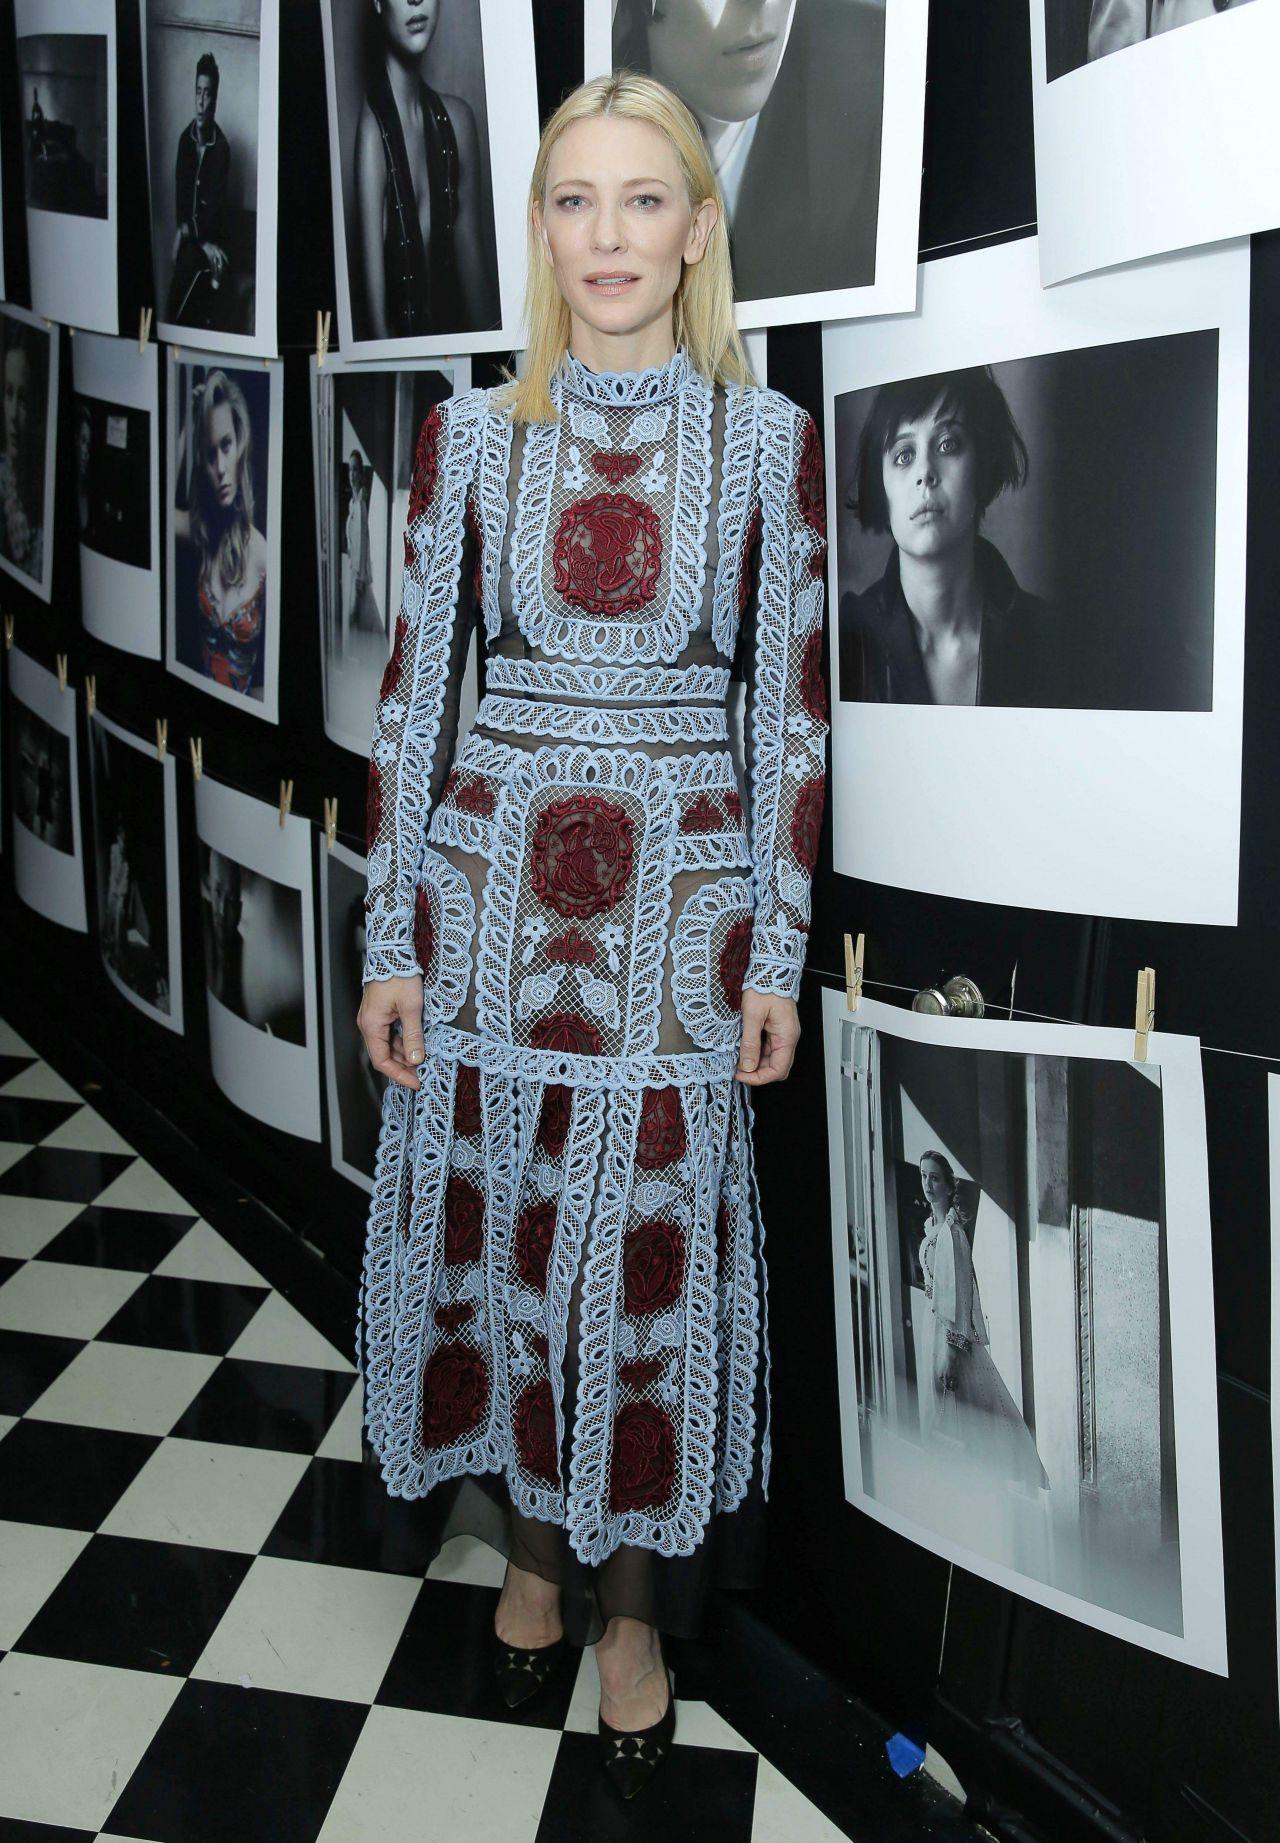 Cate Blanchett - W Magazine 2016 Golden Globe Party Cate Blanchett 2016